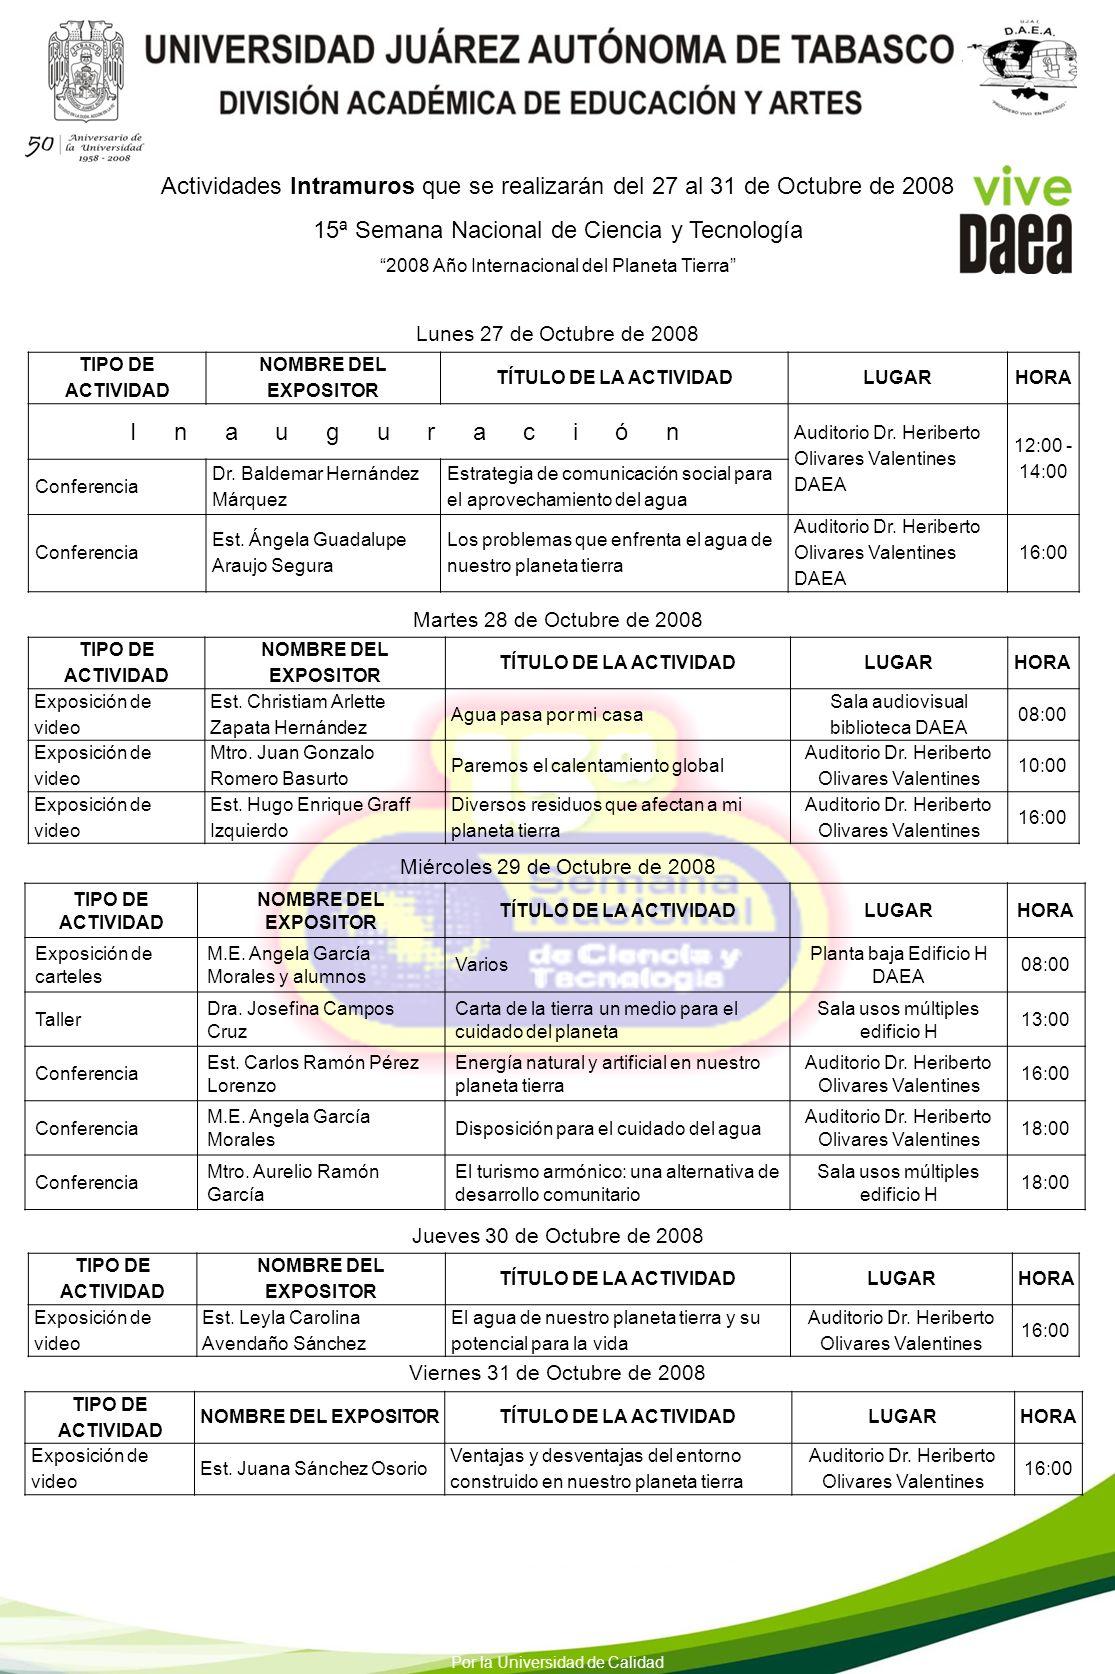 15ª Semana Nacional de Ciencia y Tecnología I n a u g u r a c i ó n